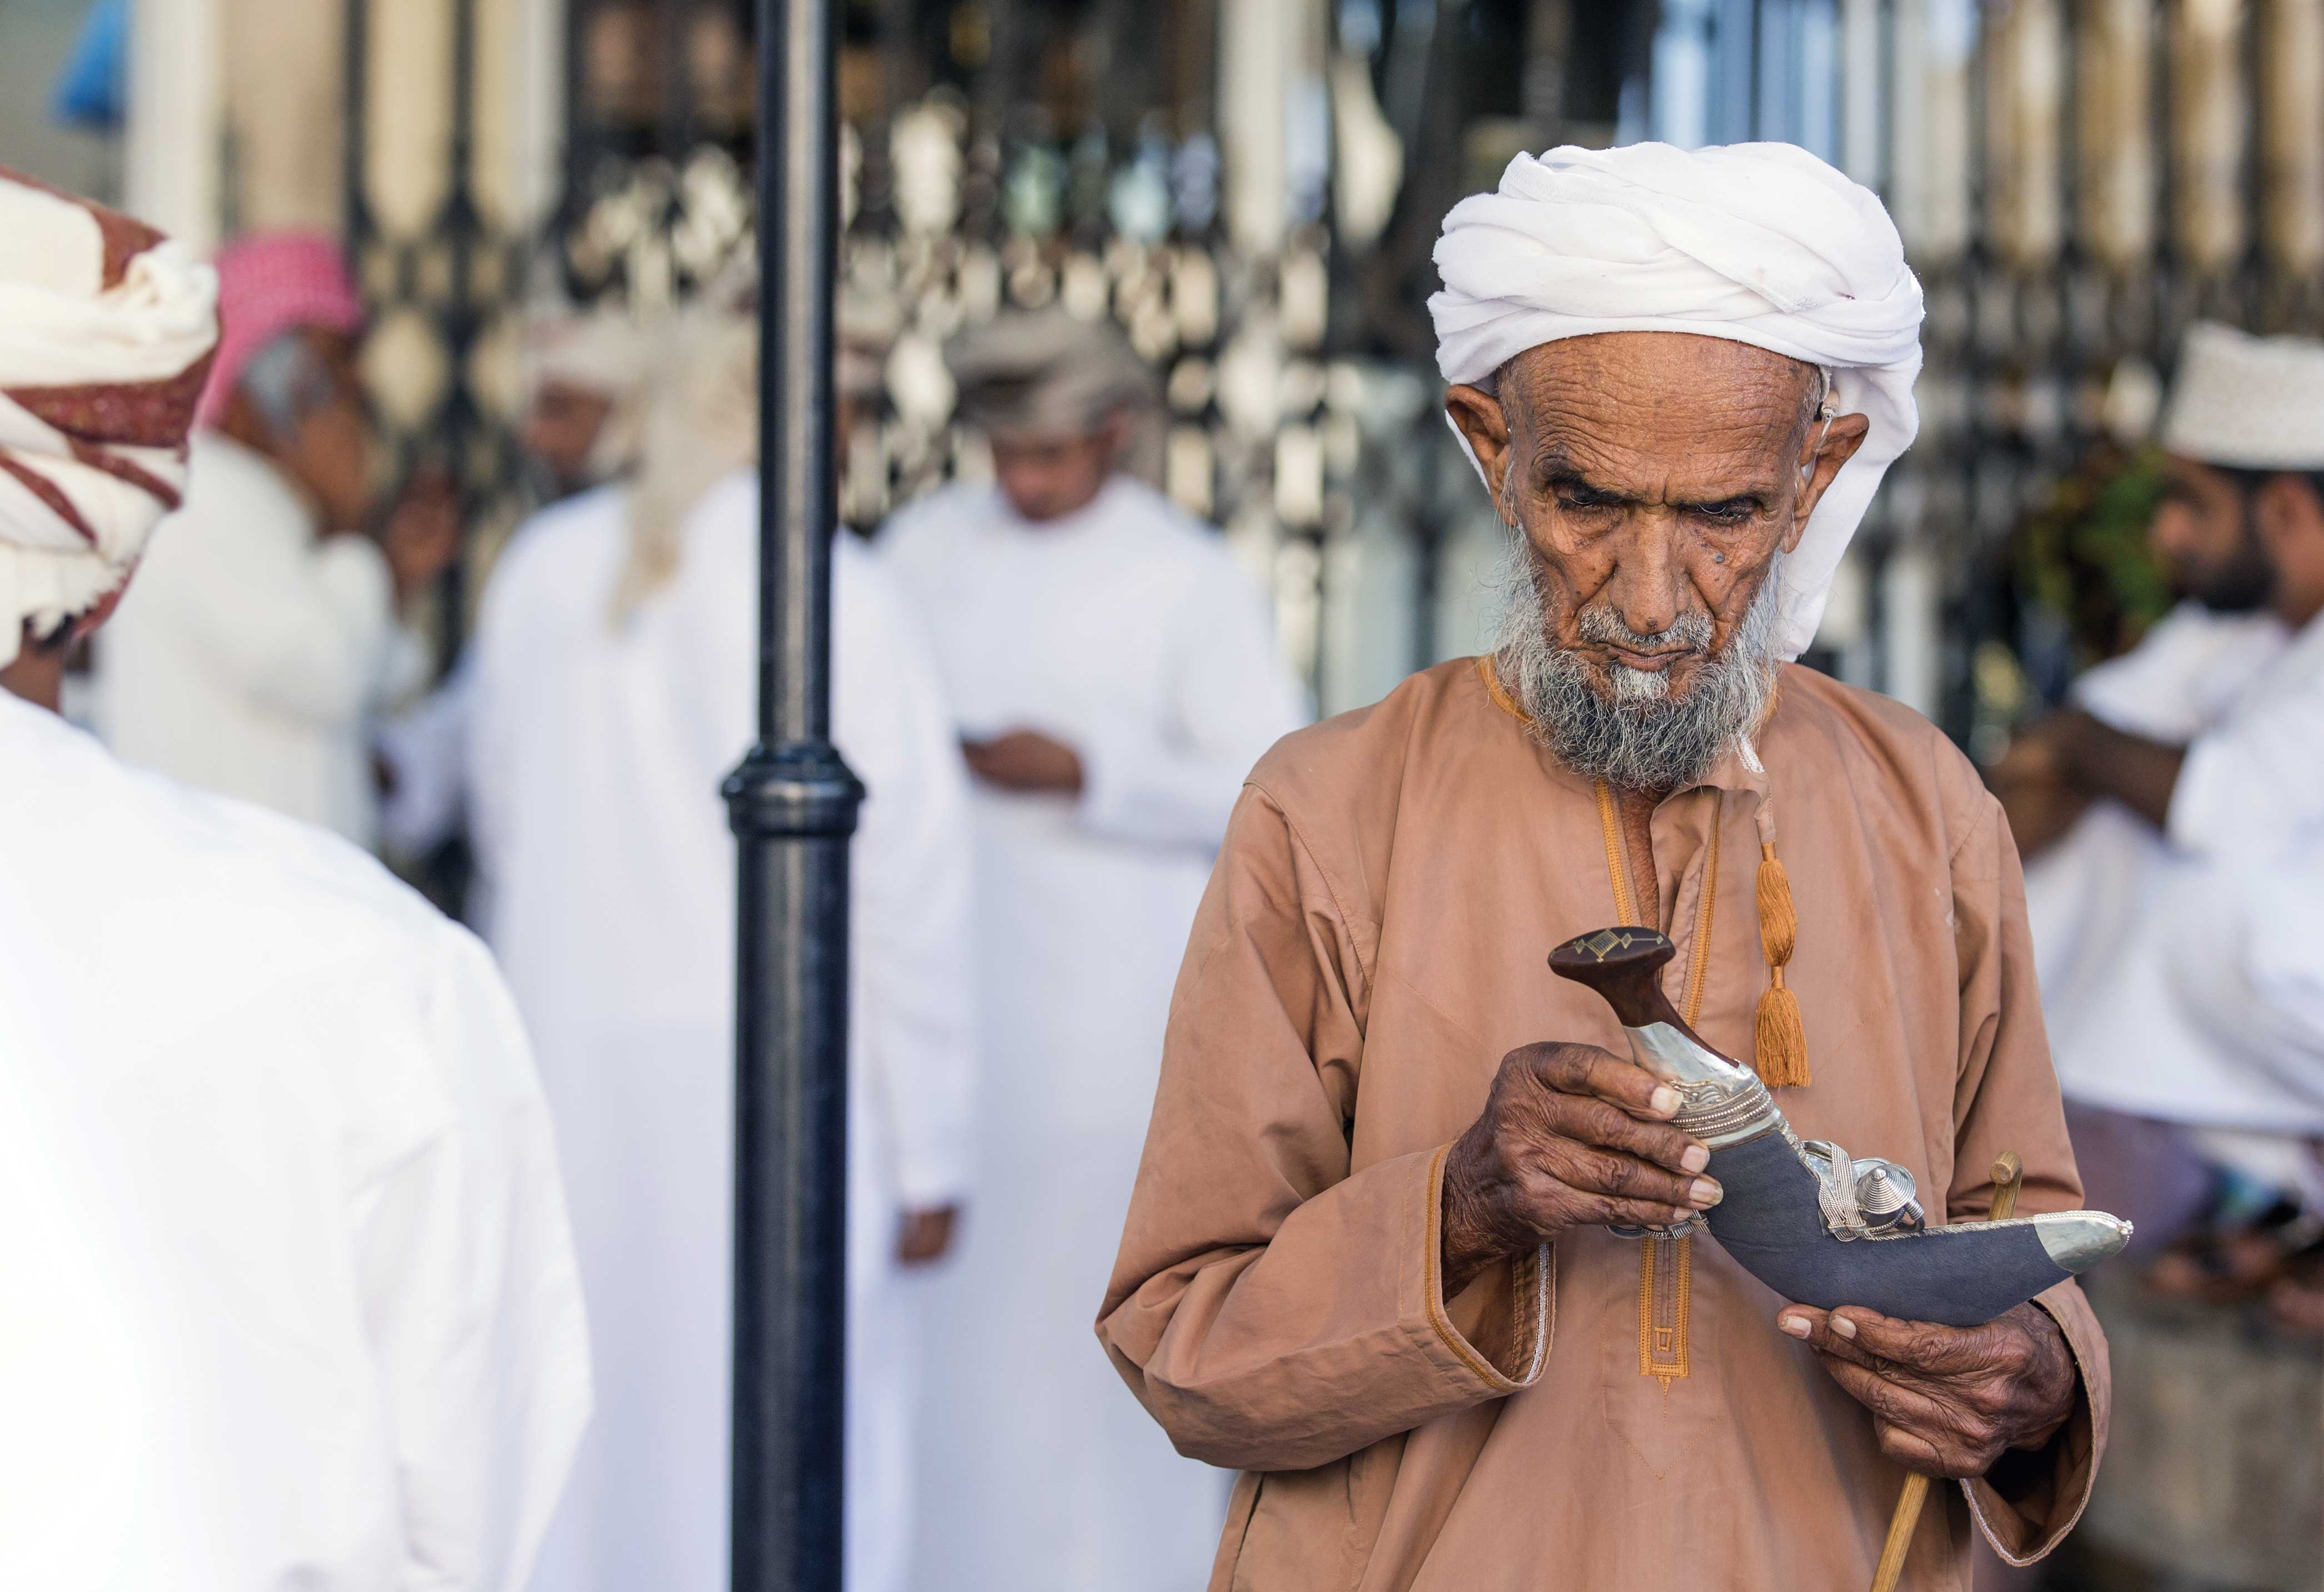 OmanPride: Oman's khanjar is a symbol of pride and history